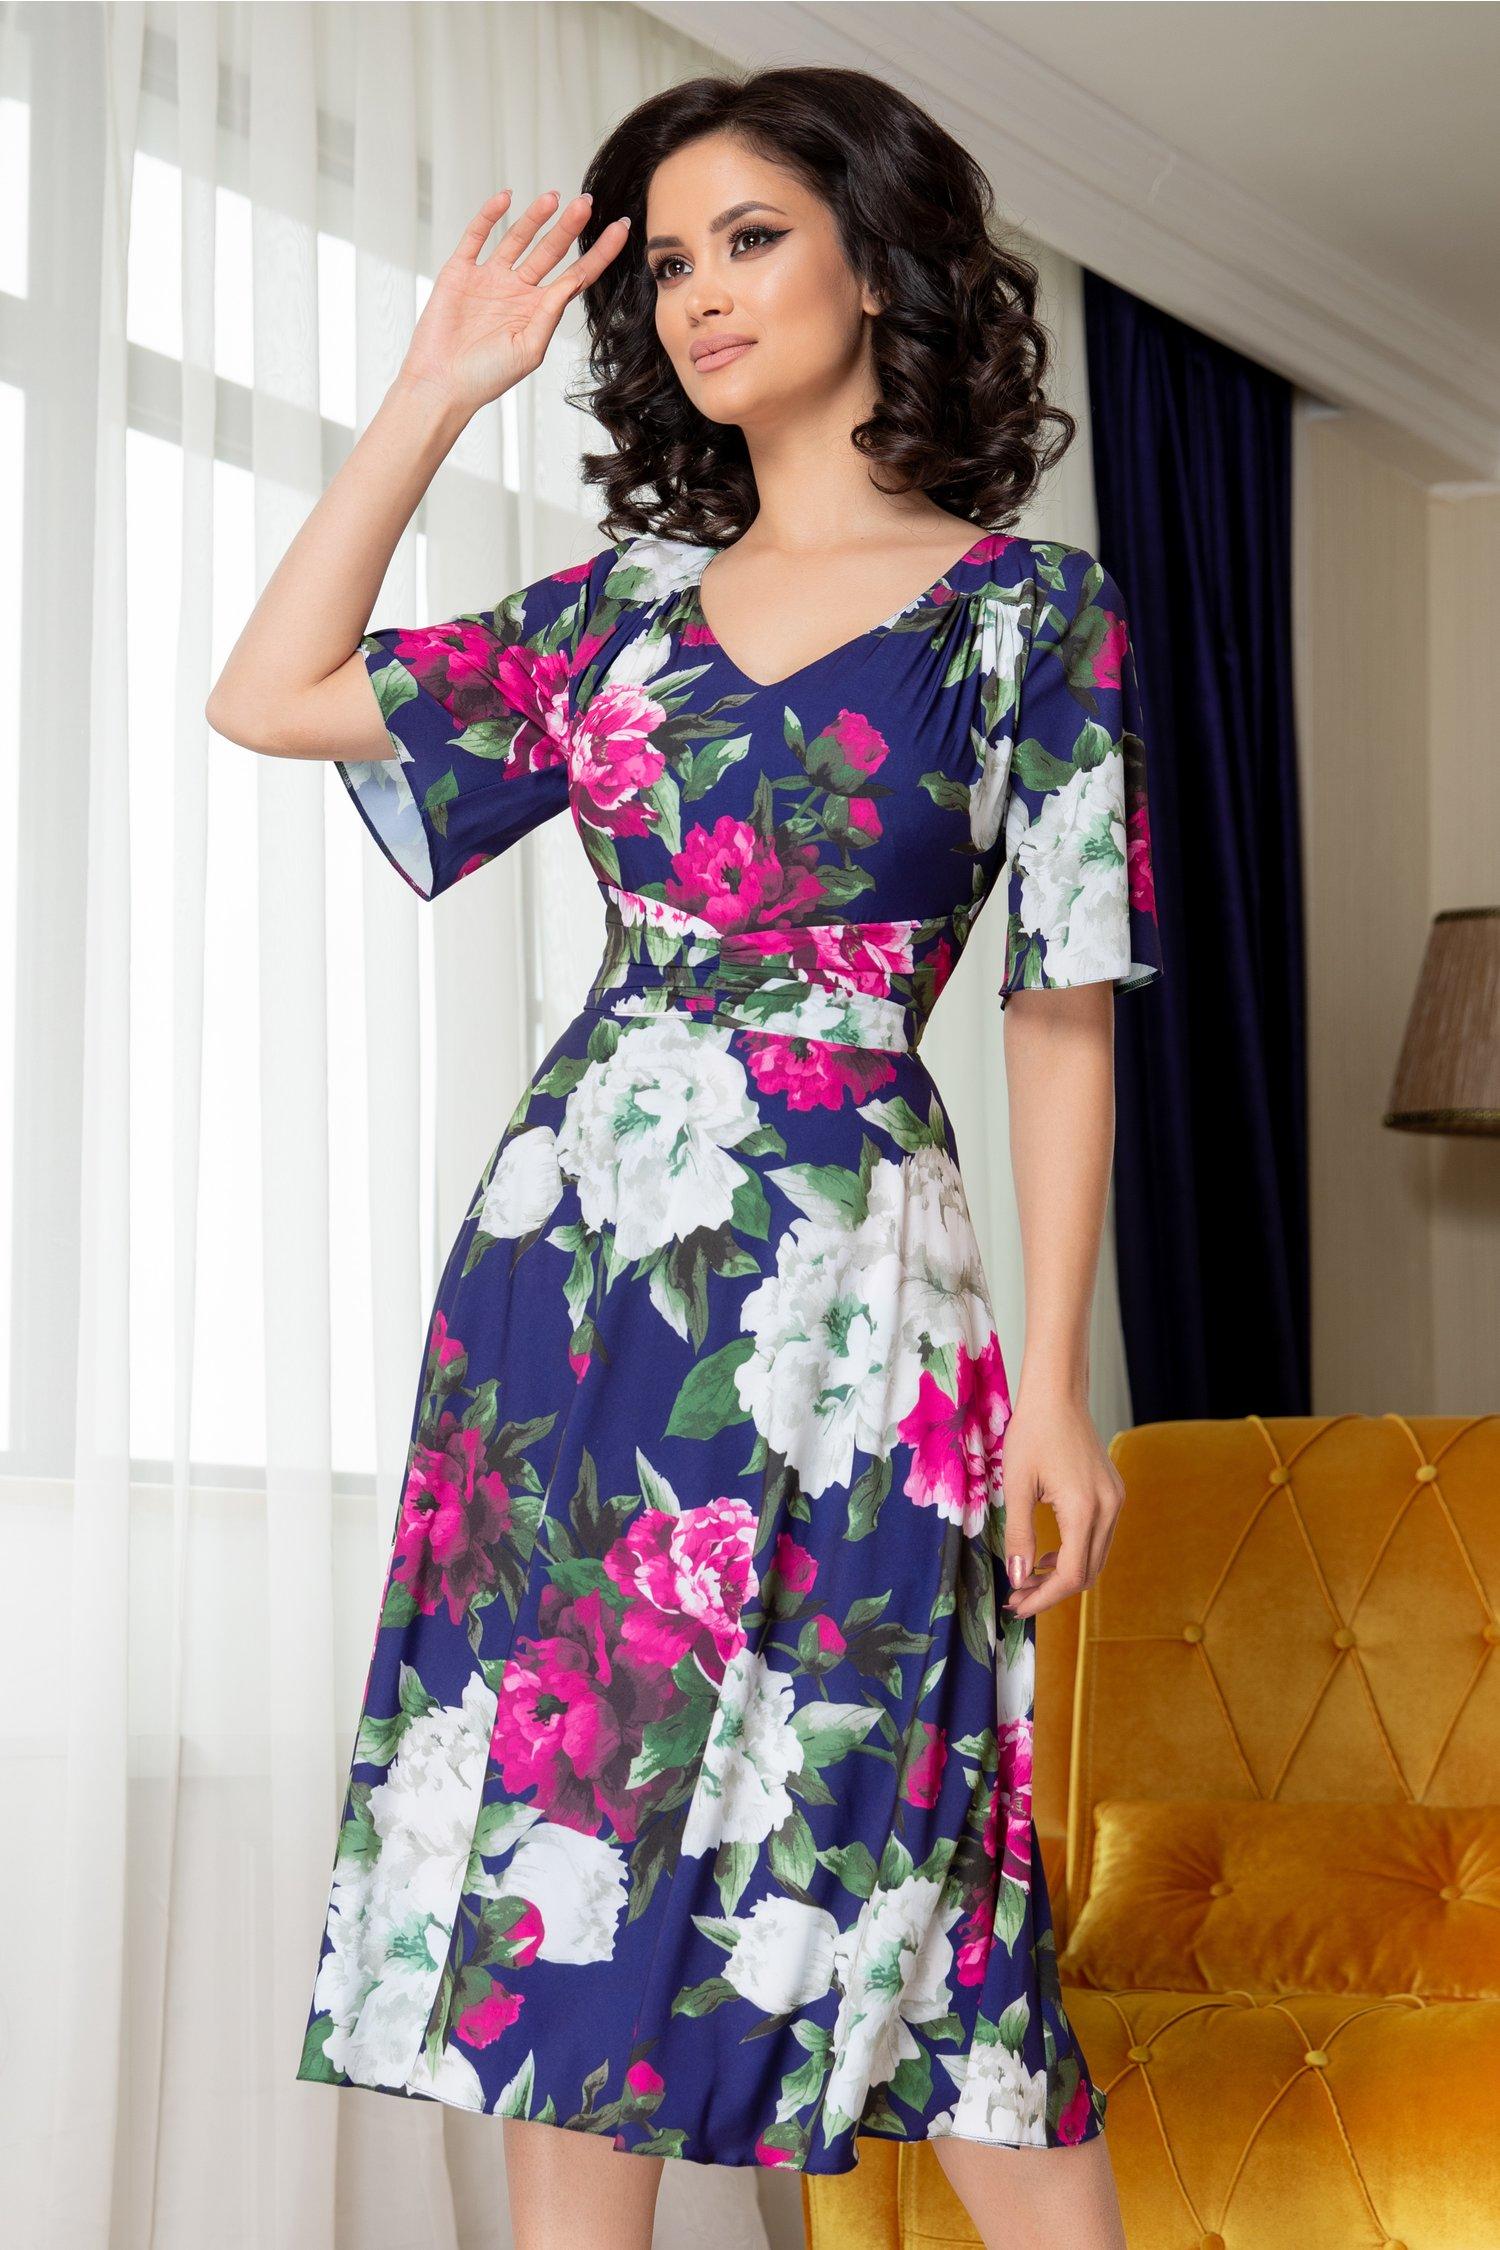 Rochie Leonard Collection indigo cu imprimeu floral